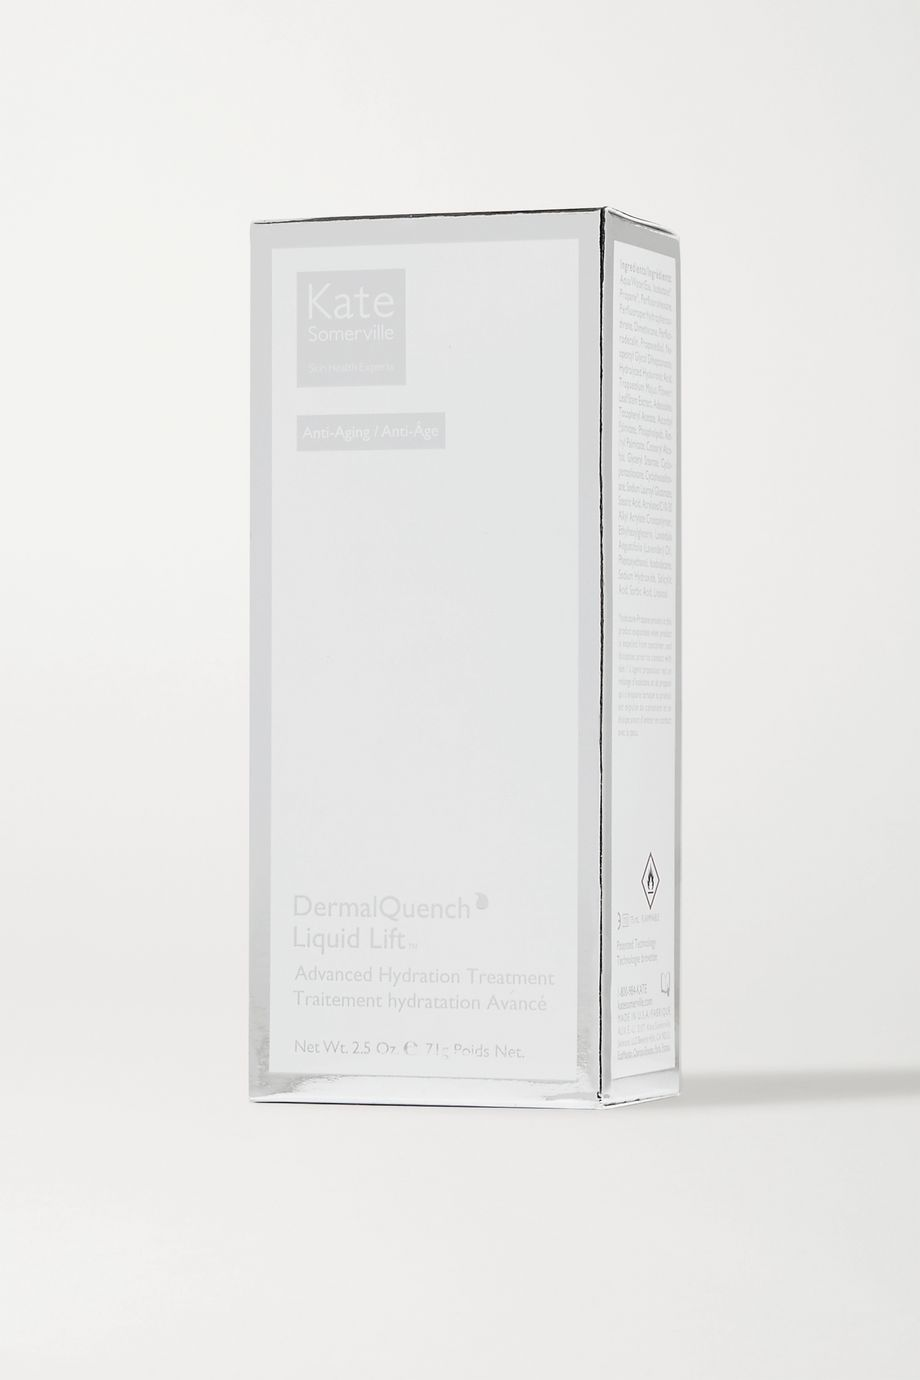 Kate Somerville DermalQuench Liquid Lift, 75ml